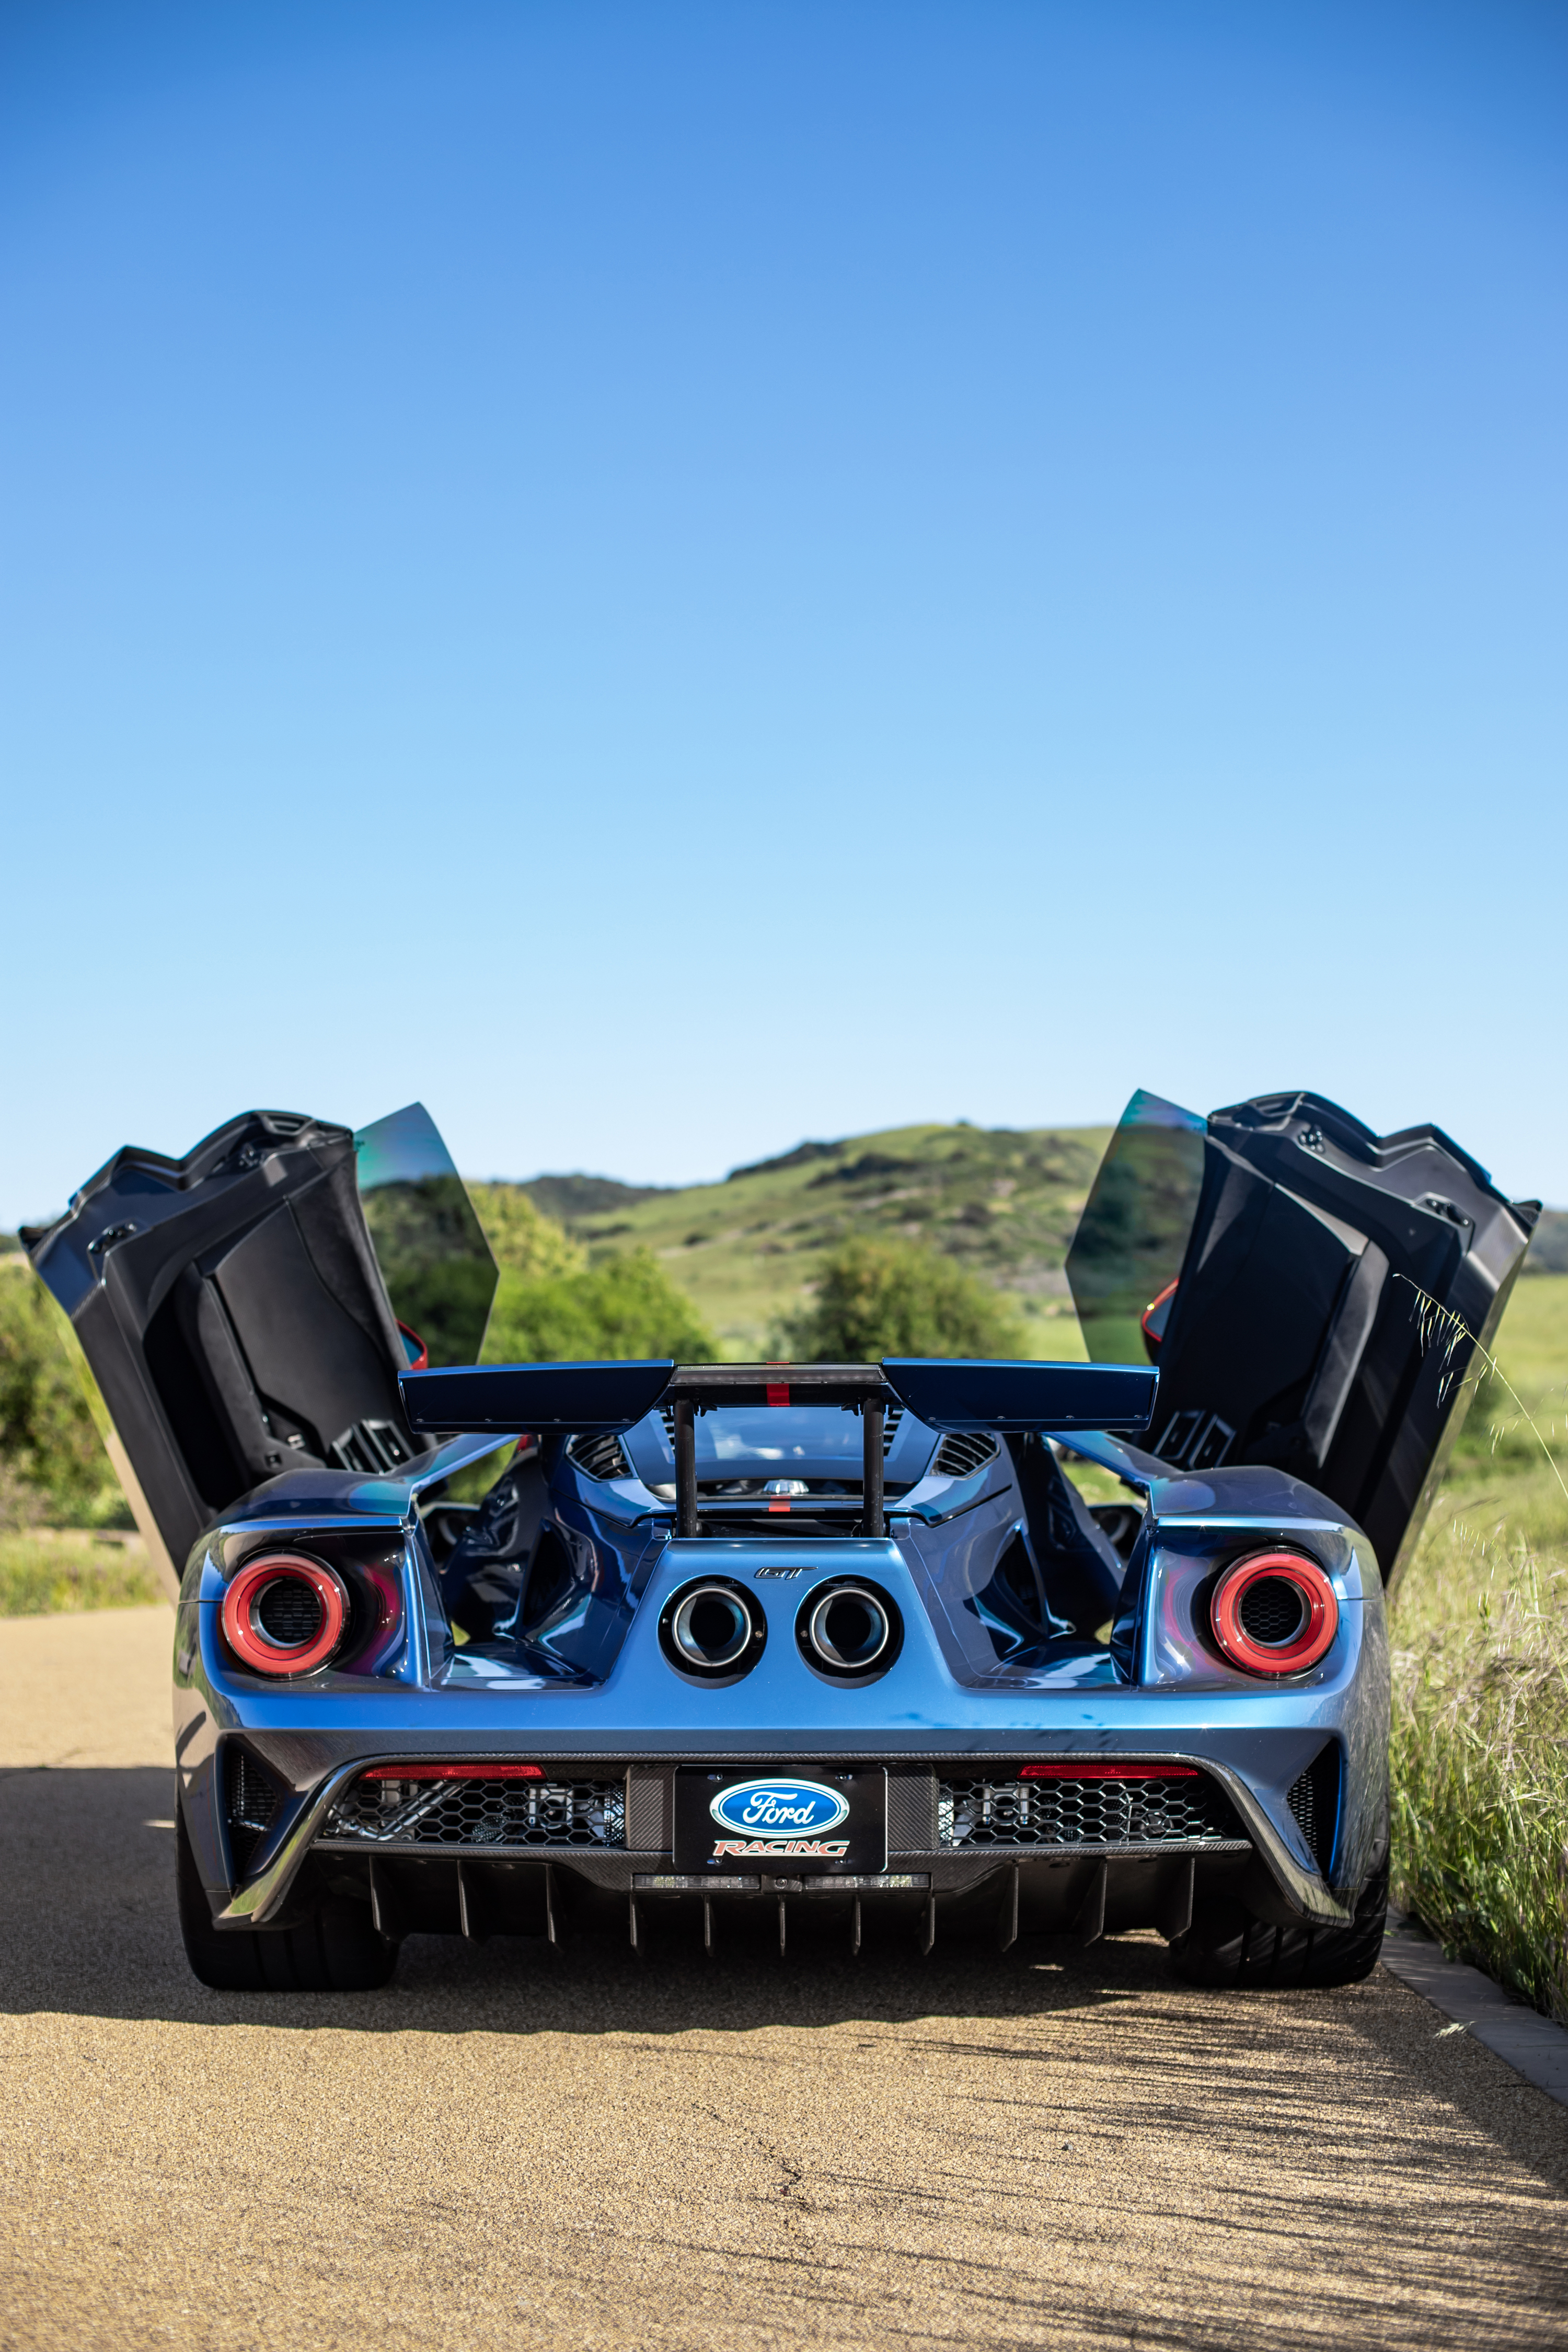 2019 Ford GT Carbon Series Rear Door Open laocexotics